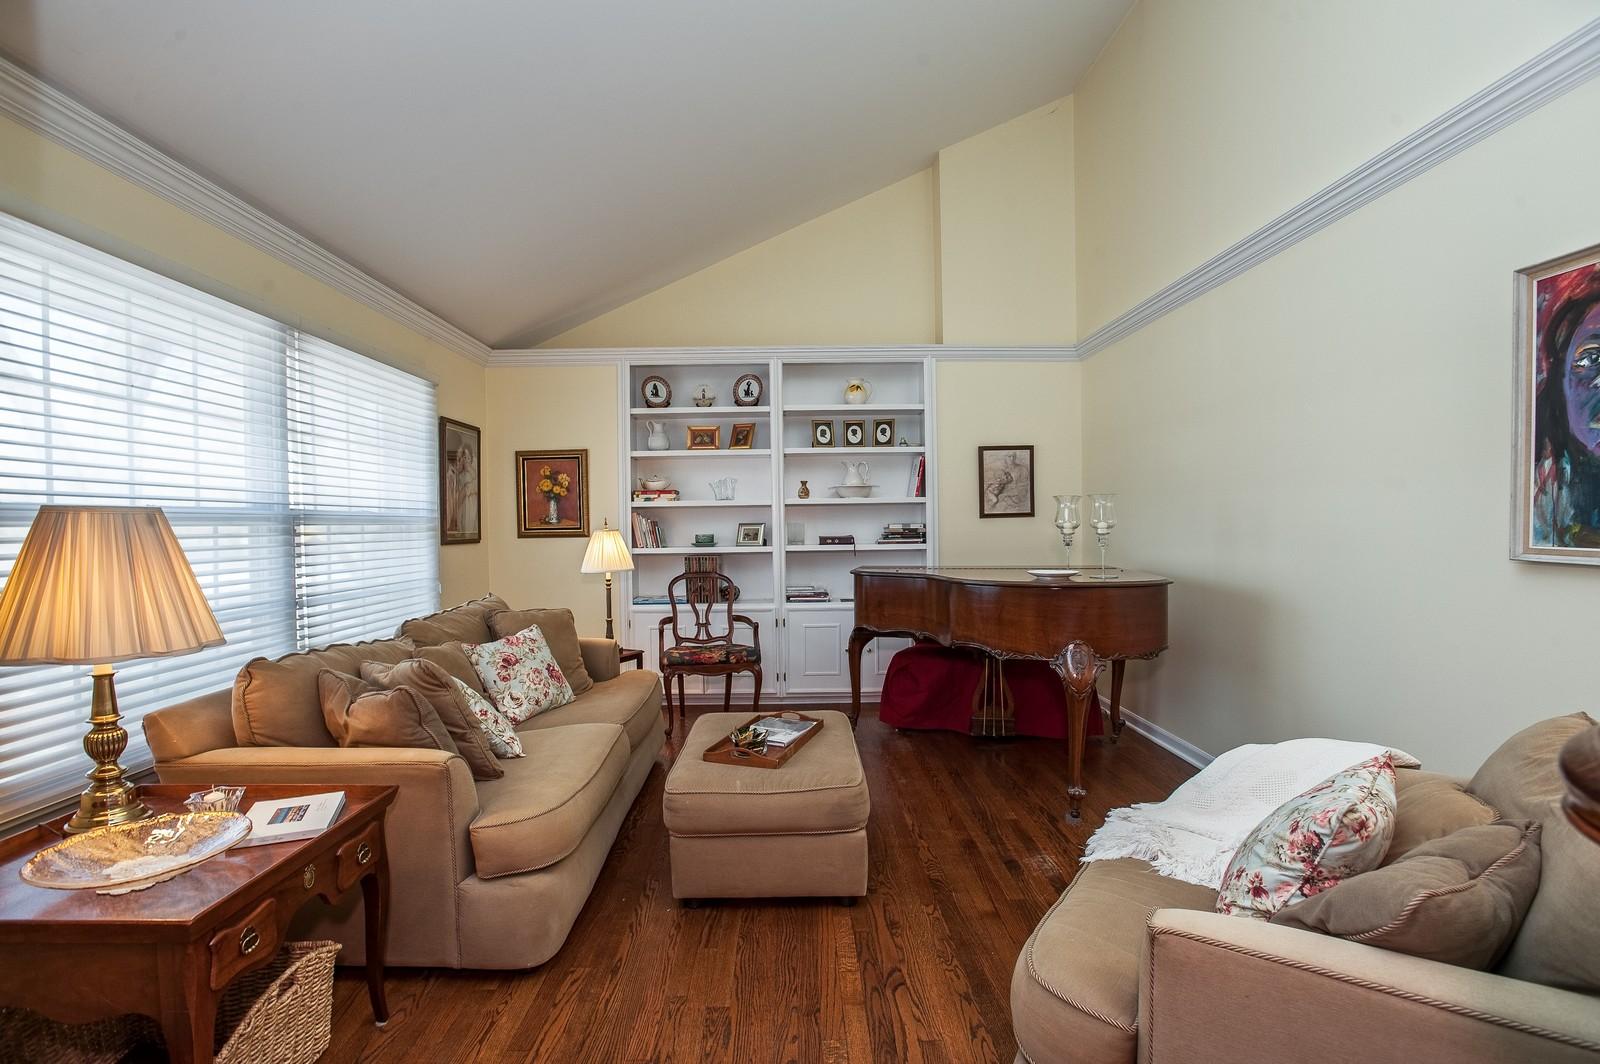 Real Estate Photography - 389 Bristol, Northfield, IL, 60093 - Living Room